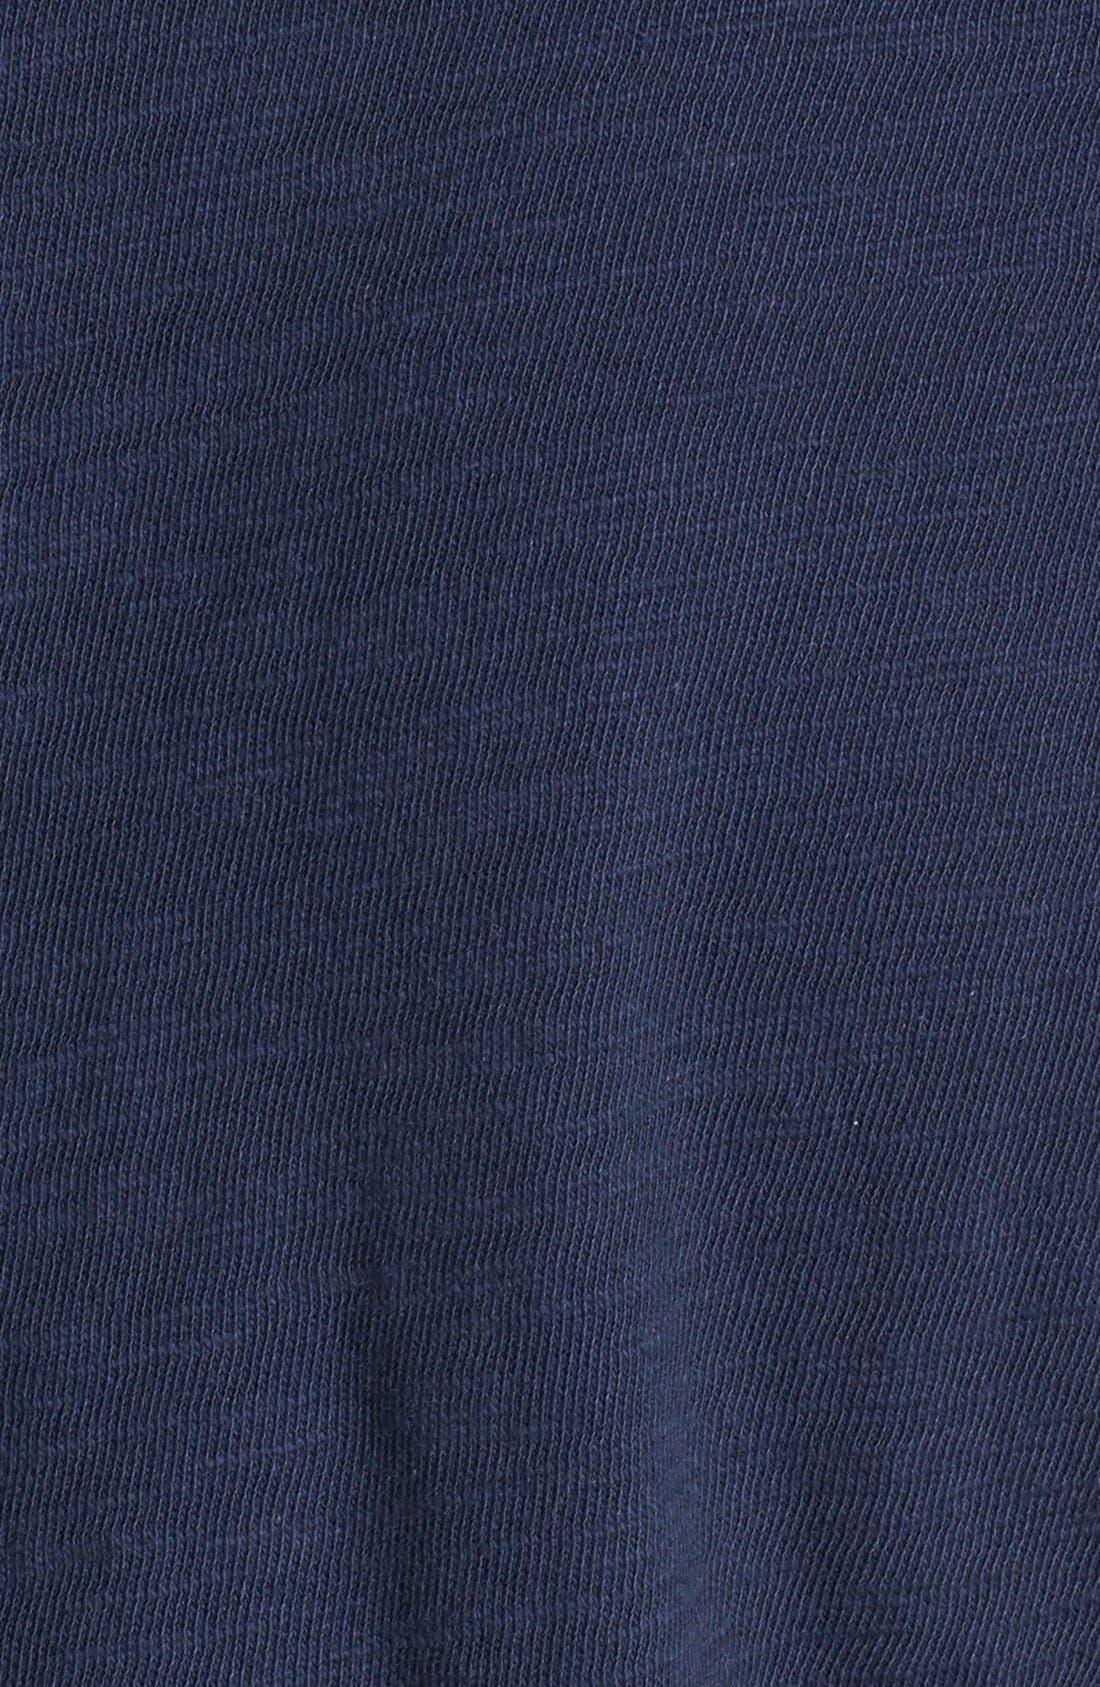 Alternate Image 3  - rag & bone Lightweight Crewneck Sweatshirt